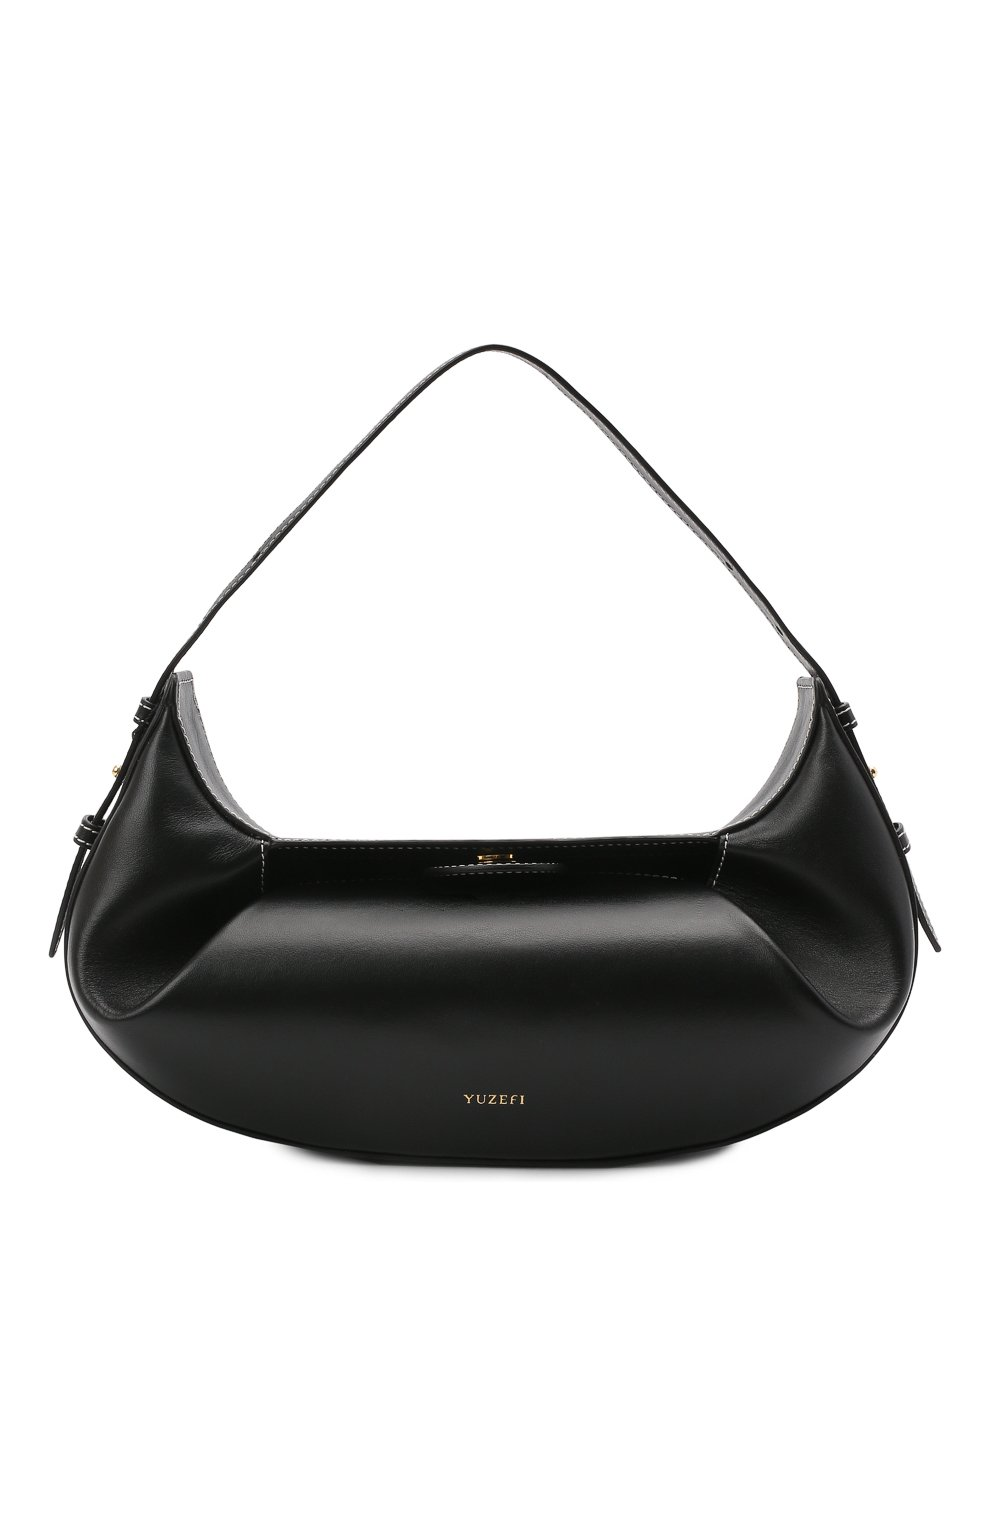 Женская сумка fortune cookie YUZEFI черного цвета, арт. YUZC0-HB-FC-00   Фото 1 (Сумки-технические: Сумки top-handle; Размер: medium; Материал: Натуральная кожа)